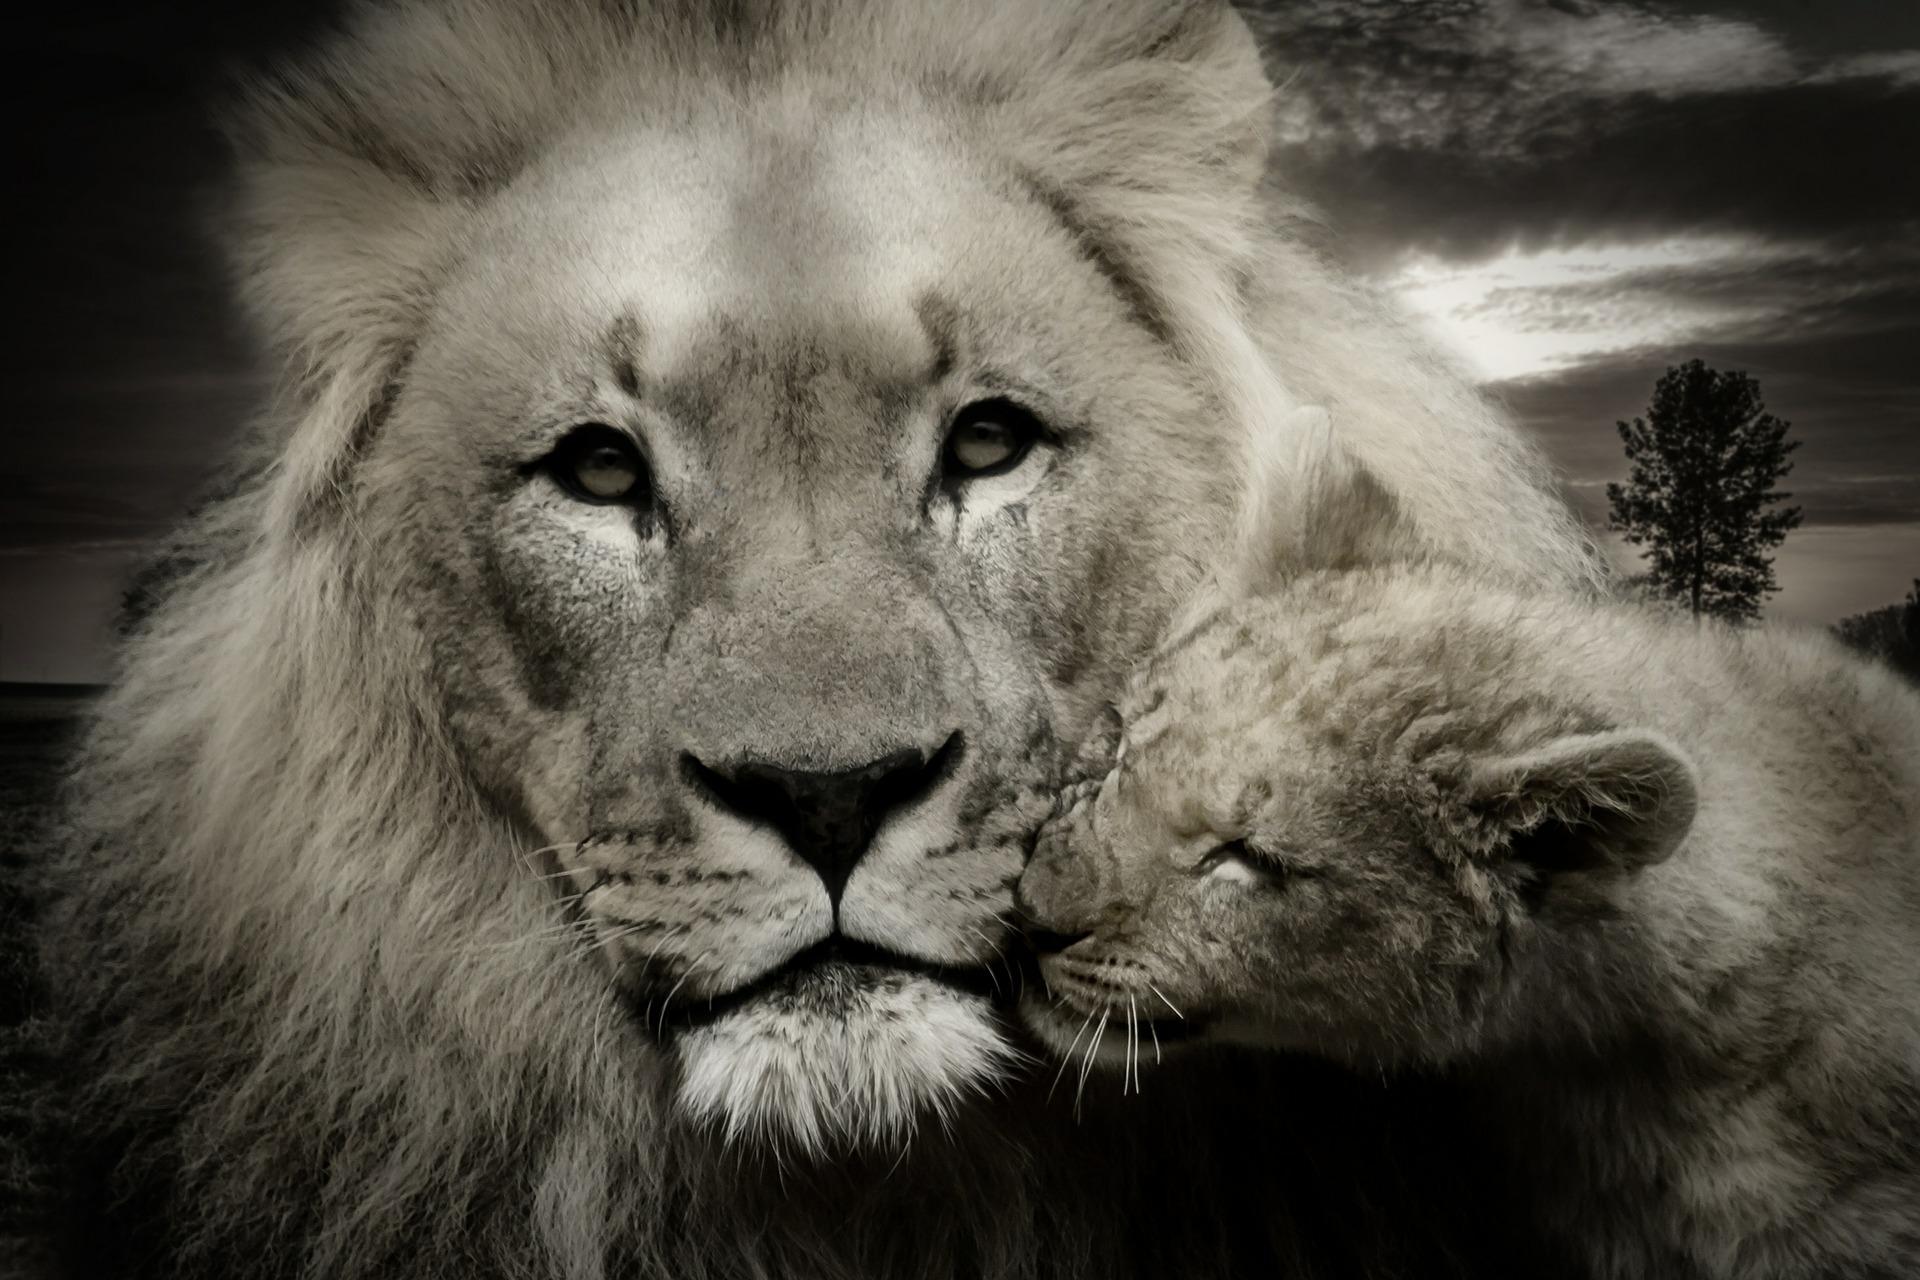 lion-608251_1920.jpg